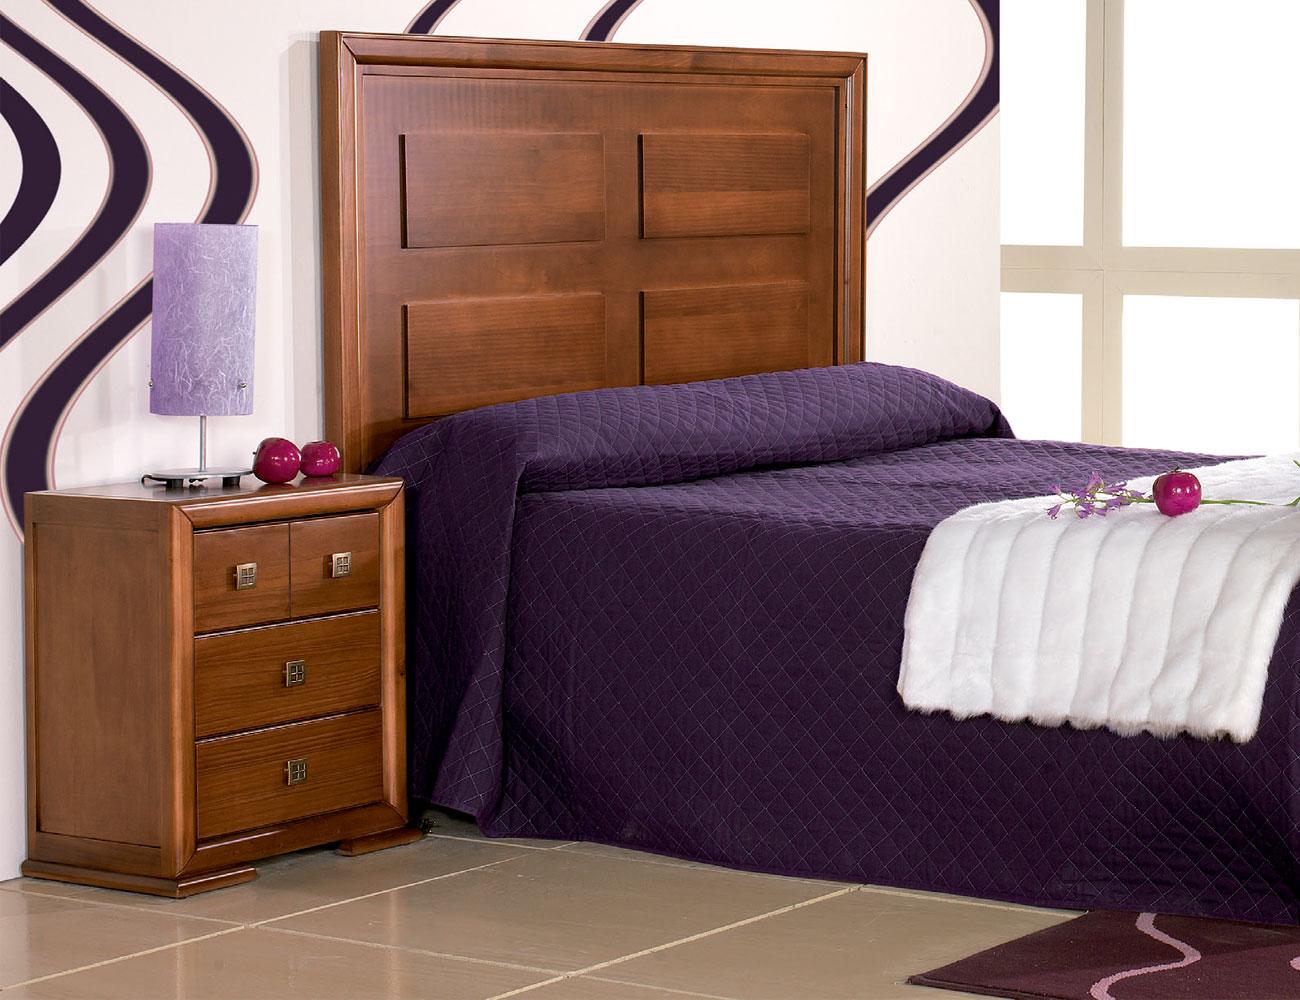 Composicion02 dormitorio matrimonio cama sevilla